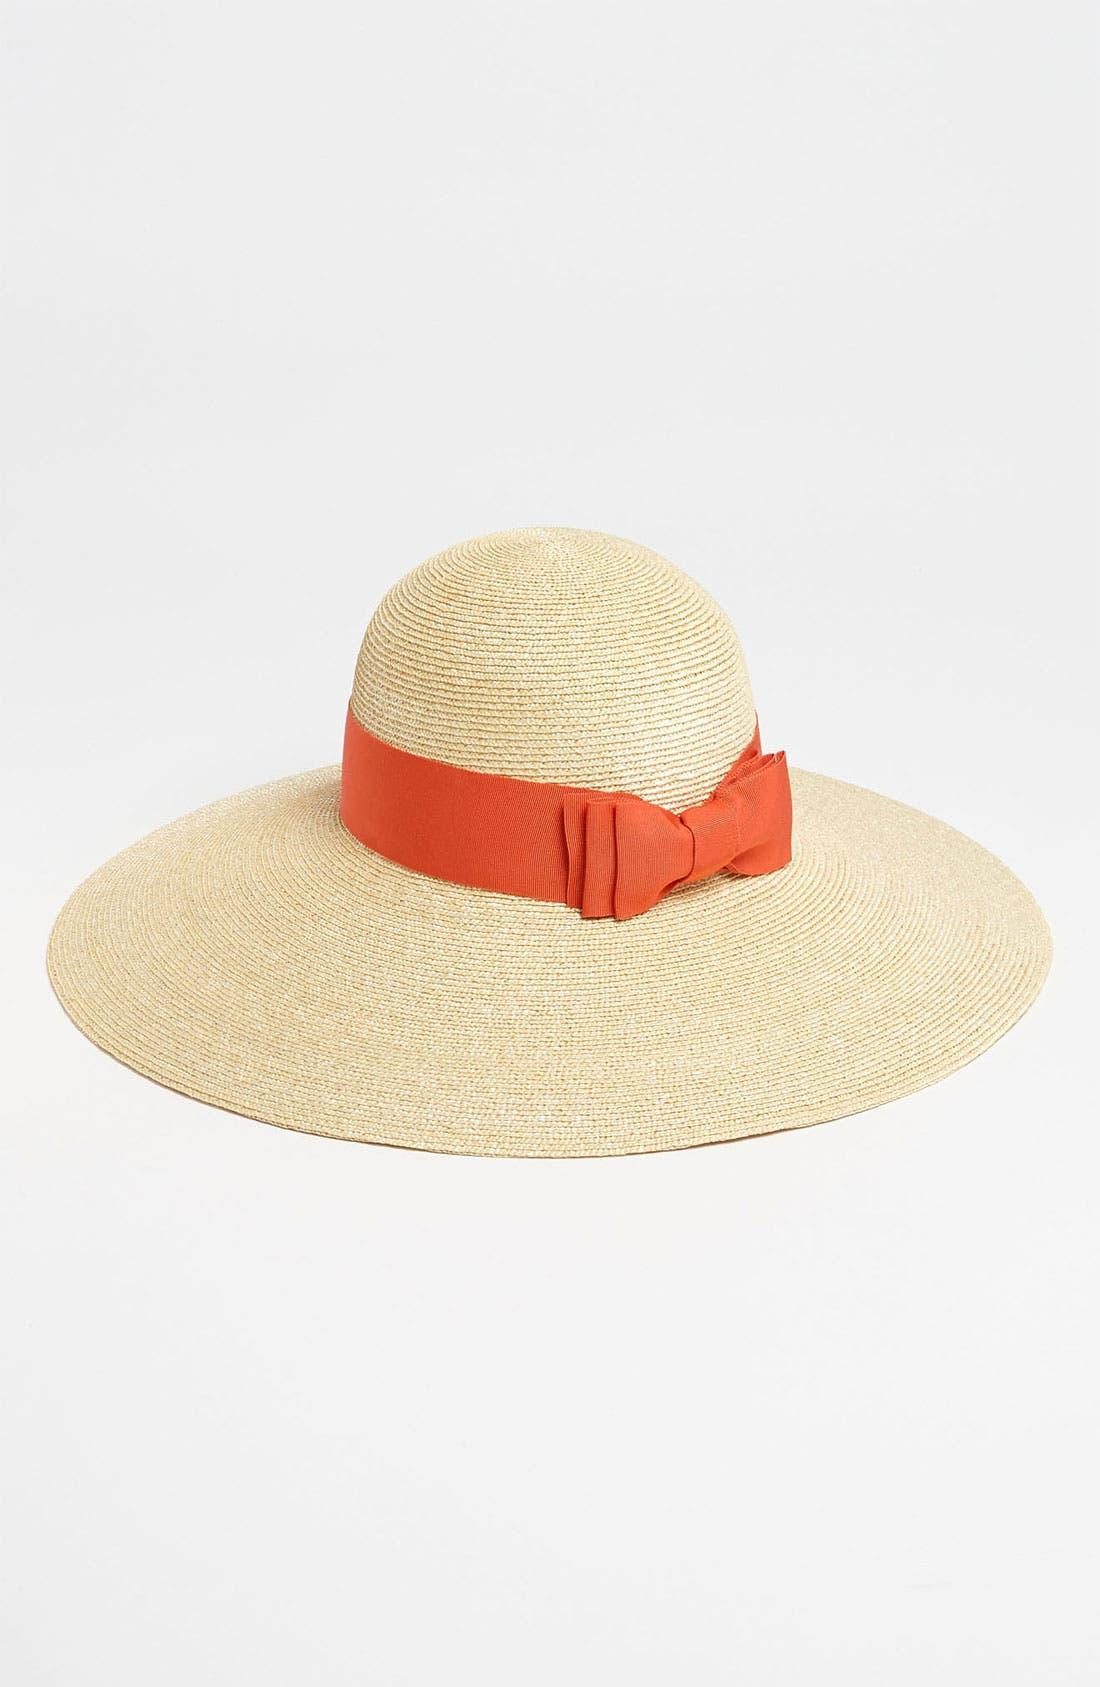 Alternate Image 1 Selected - Lanvin Straw Sun Hat